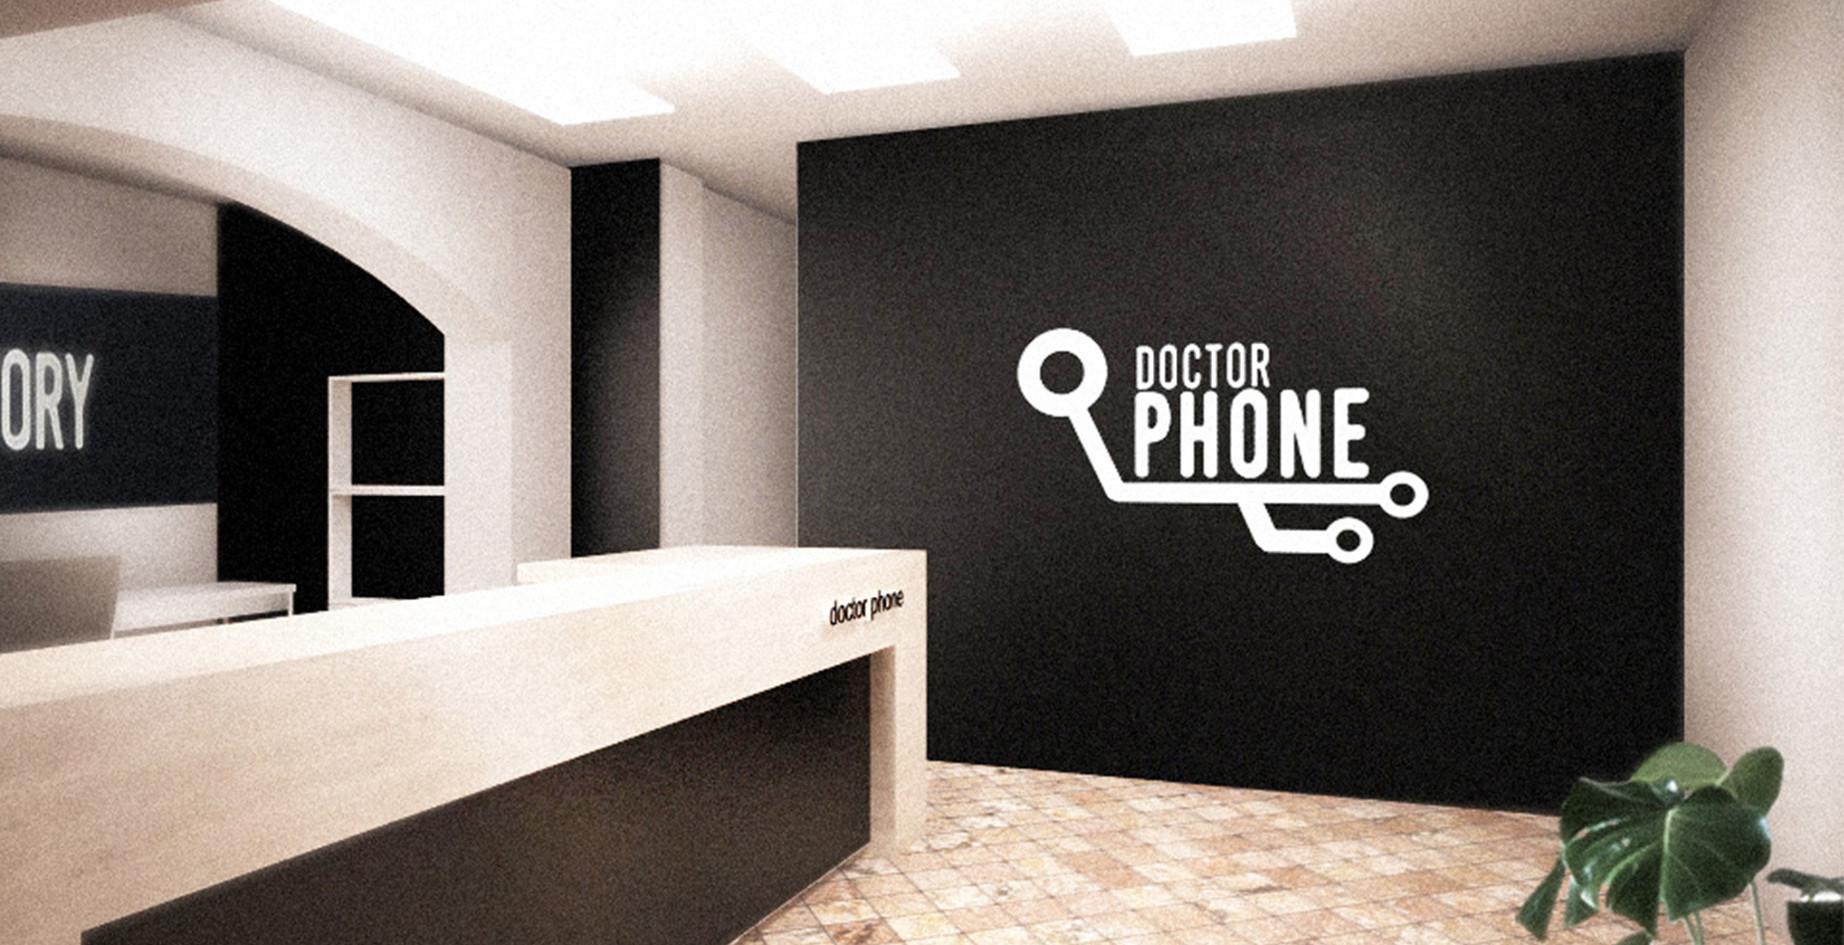 Doctor phone